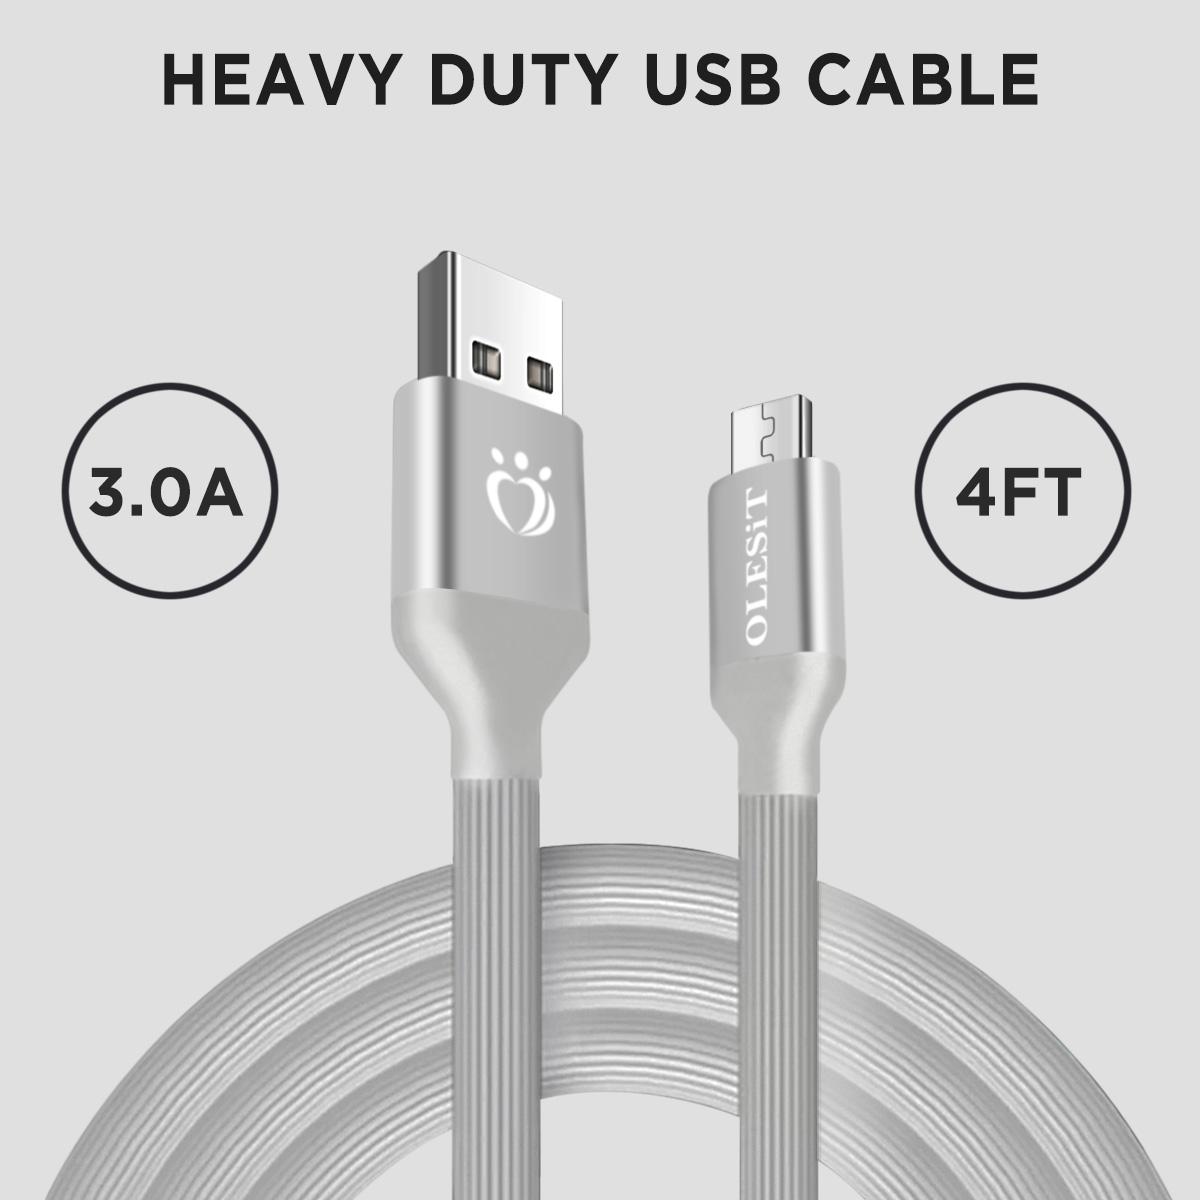 4FT-OLT-TPE-HD-USB-V8-WT